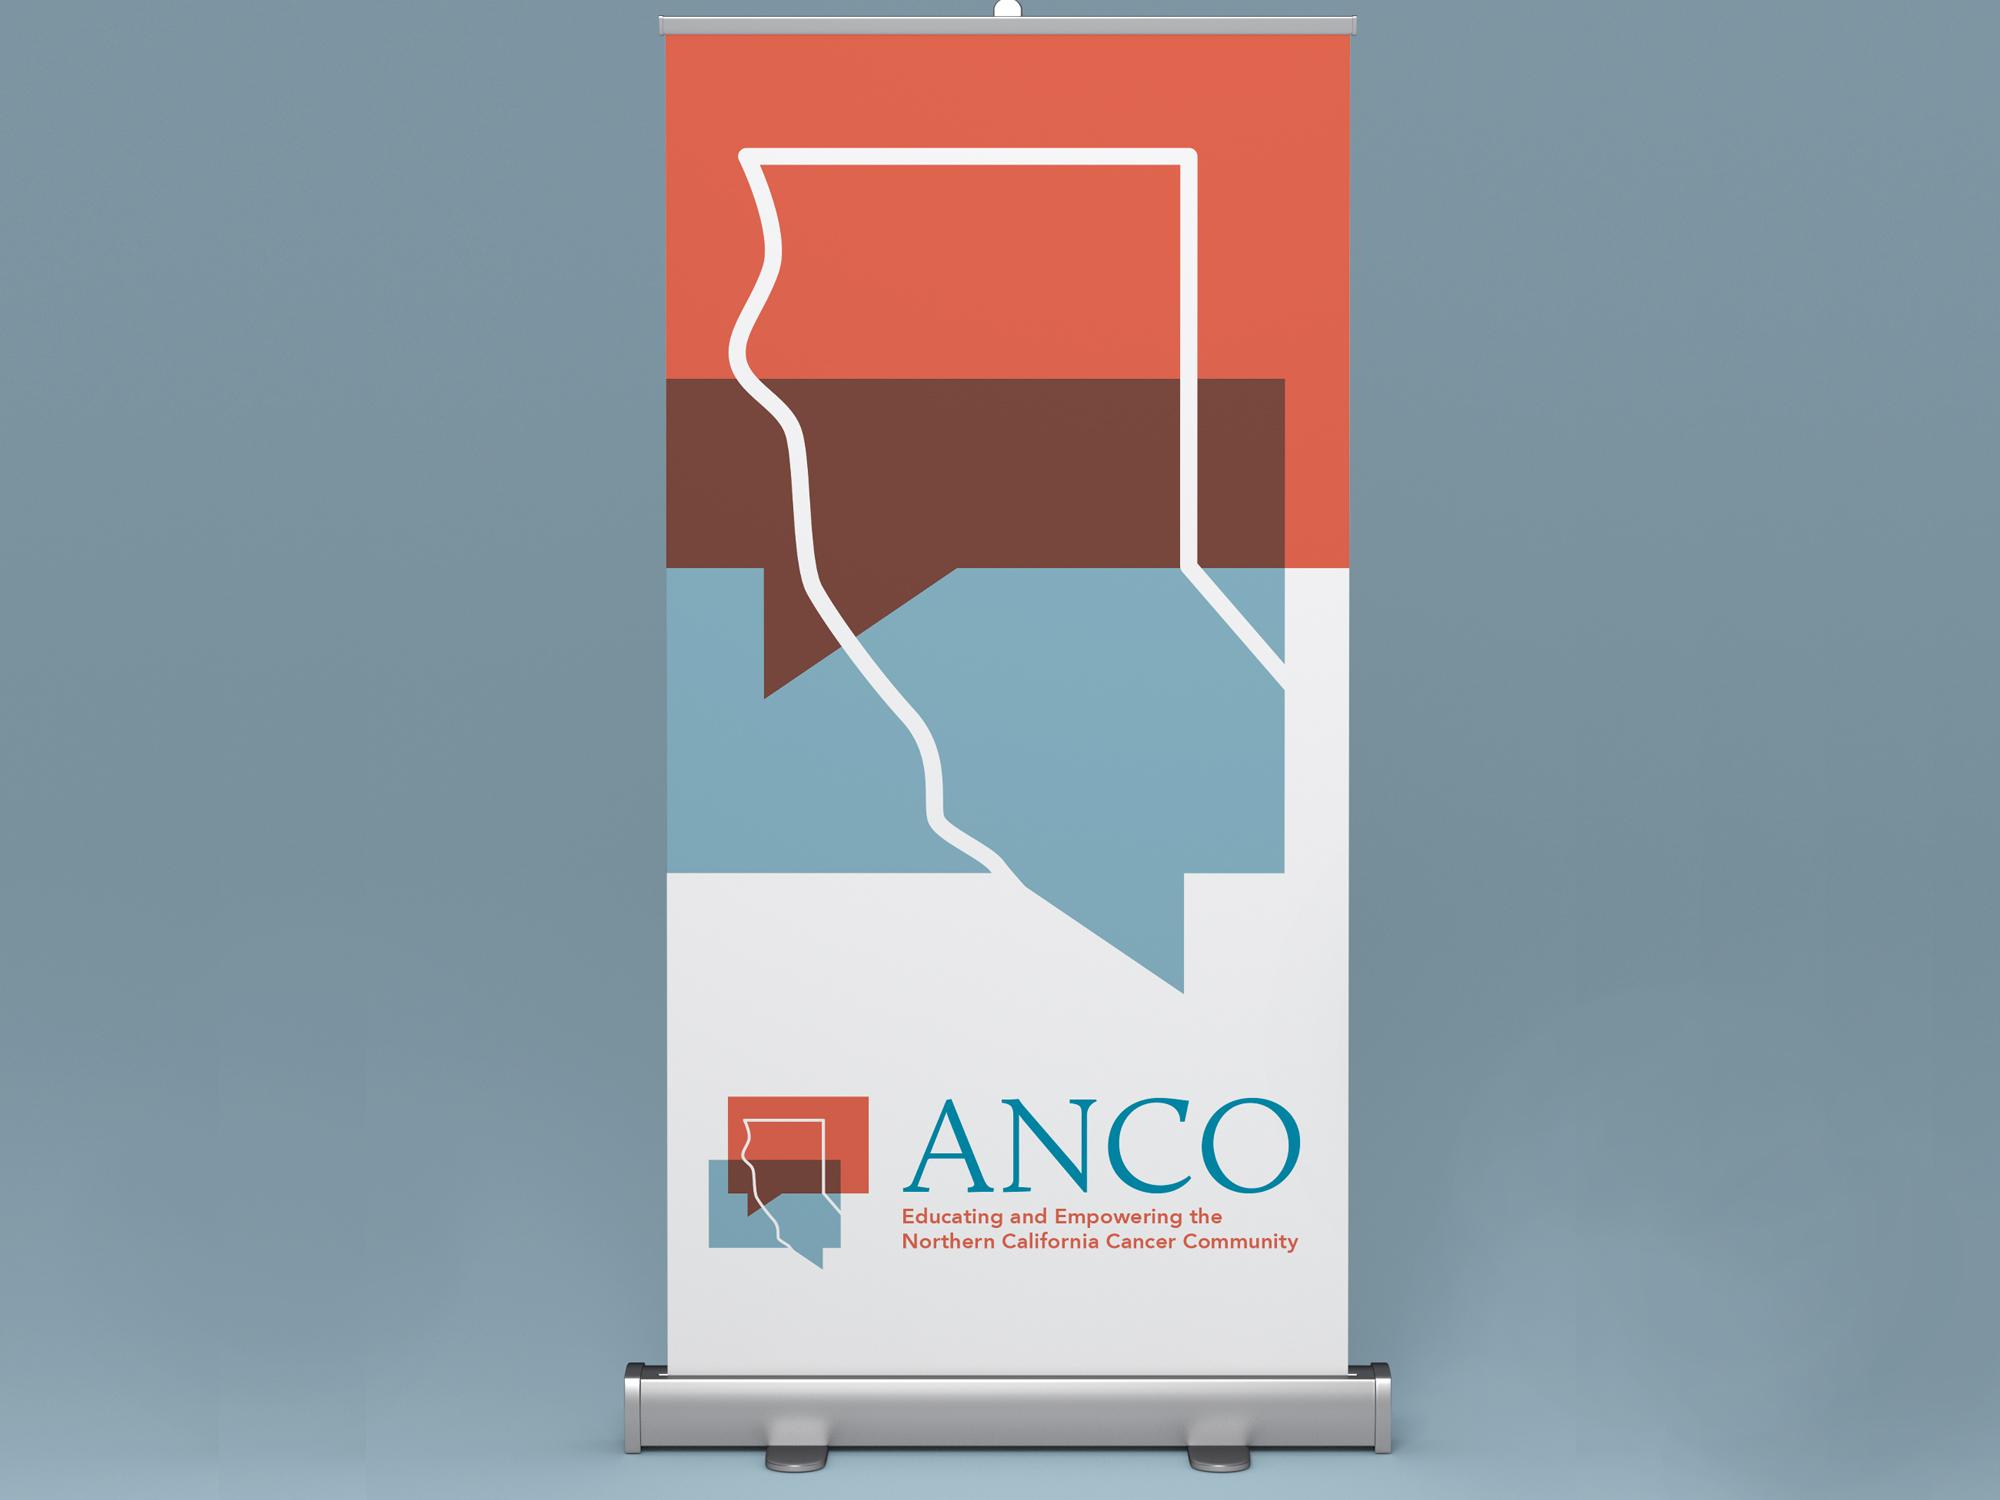 anco-banner